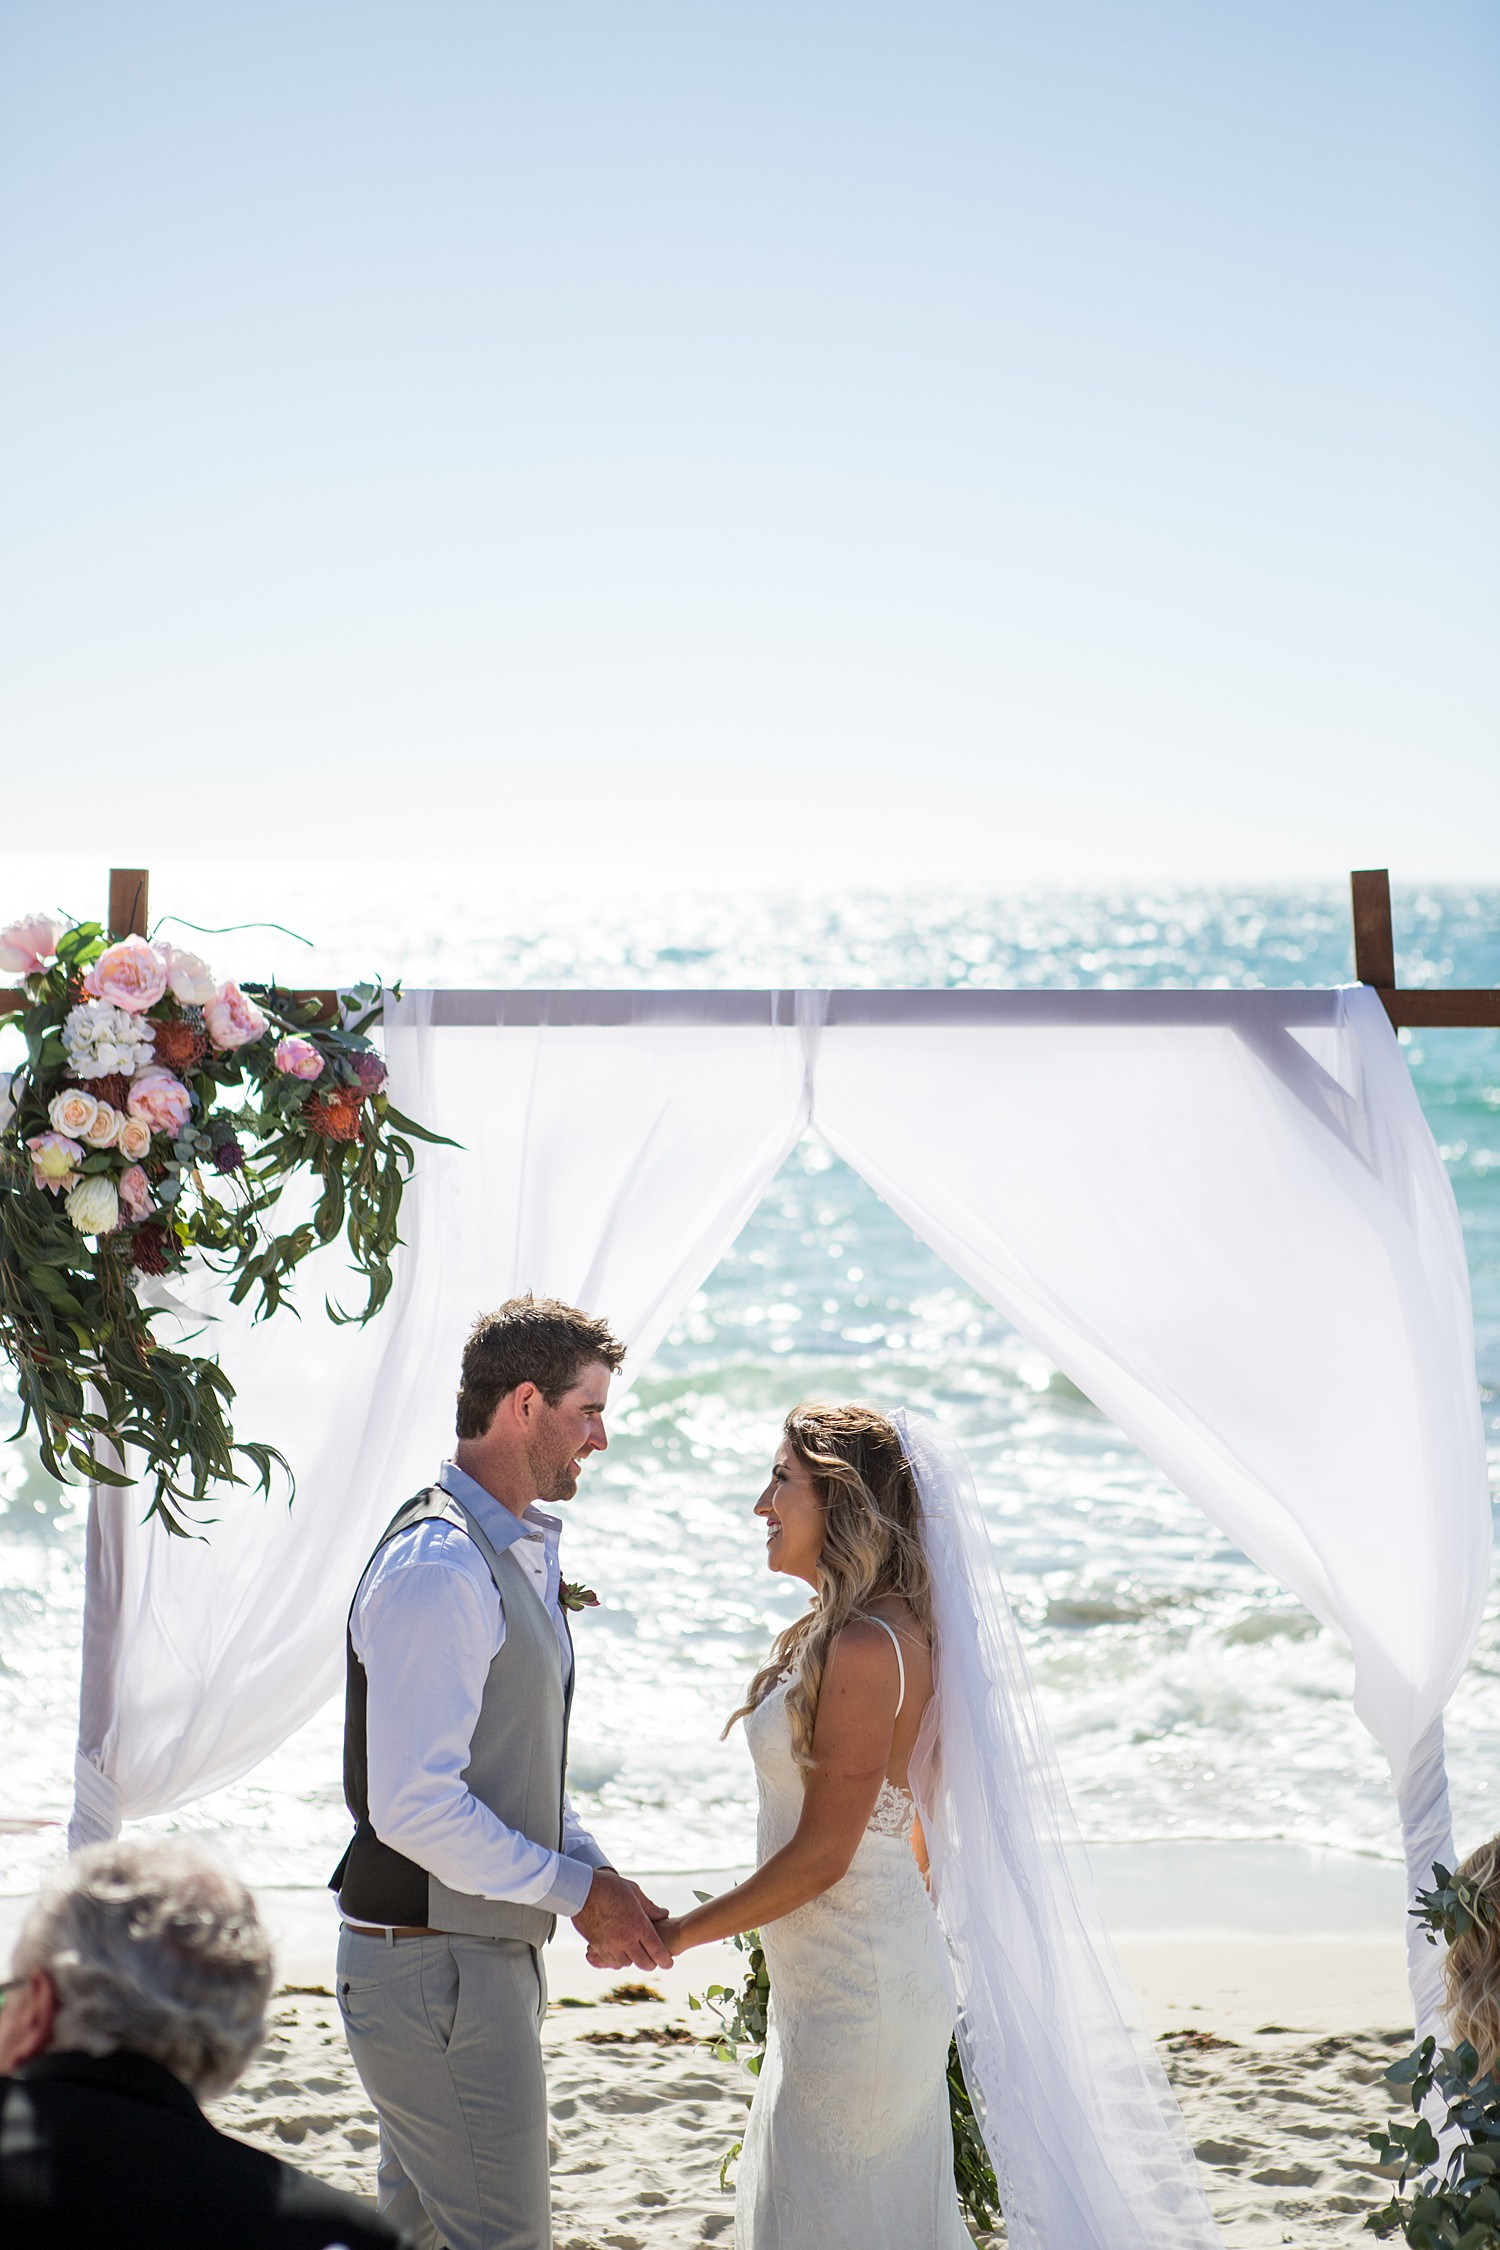 trigg_beach_wedding_perth (30).jpg